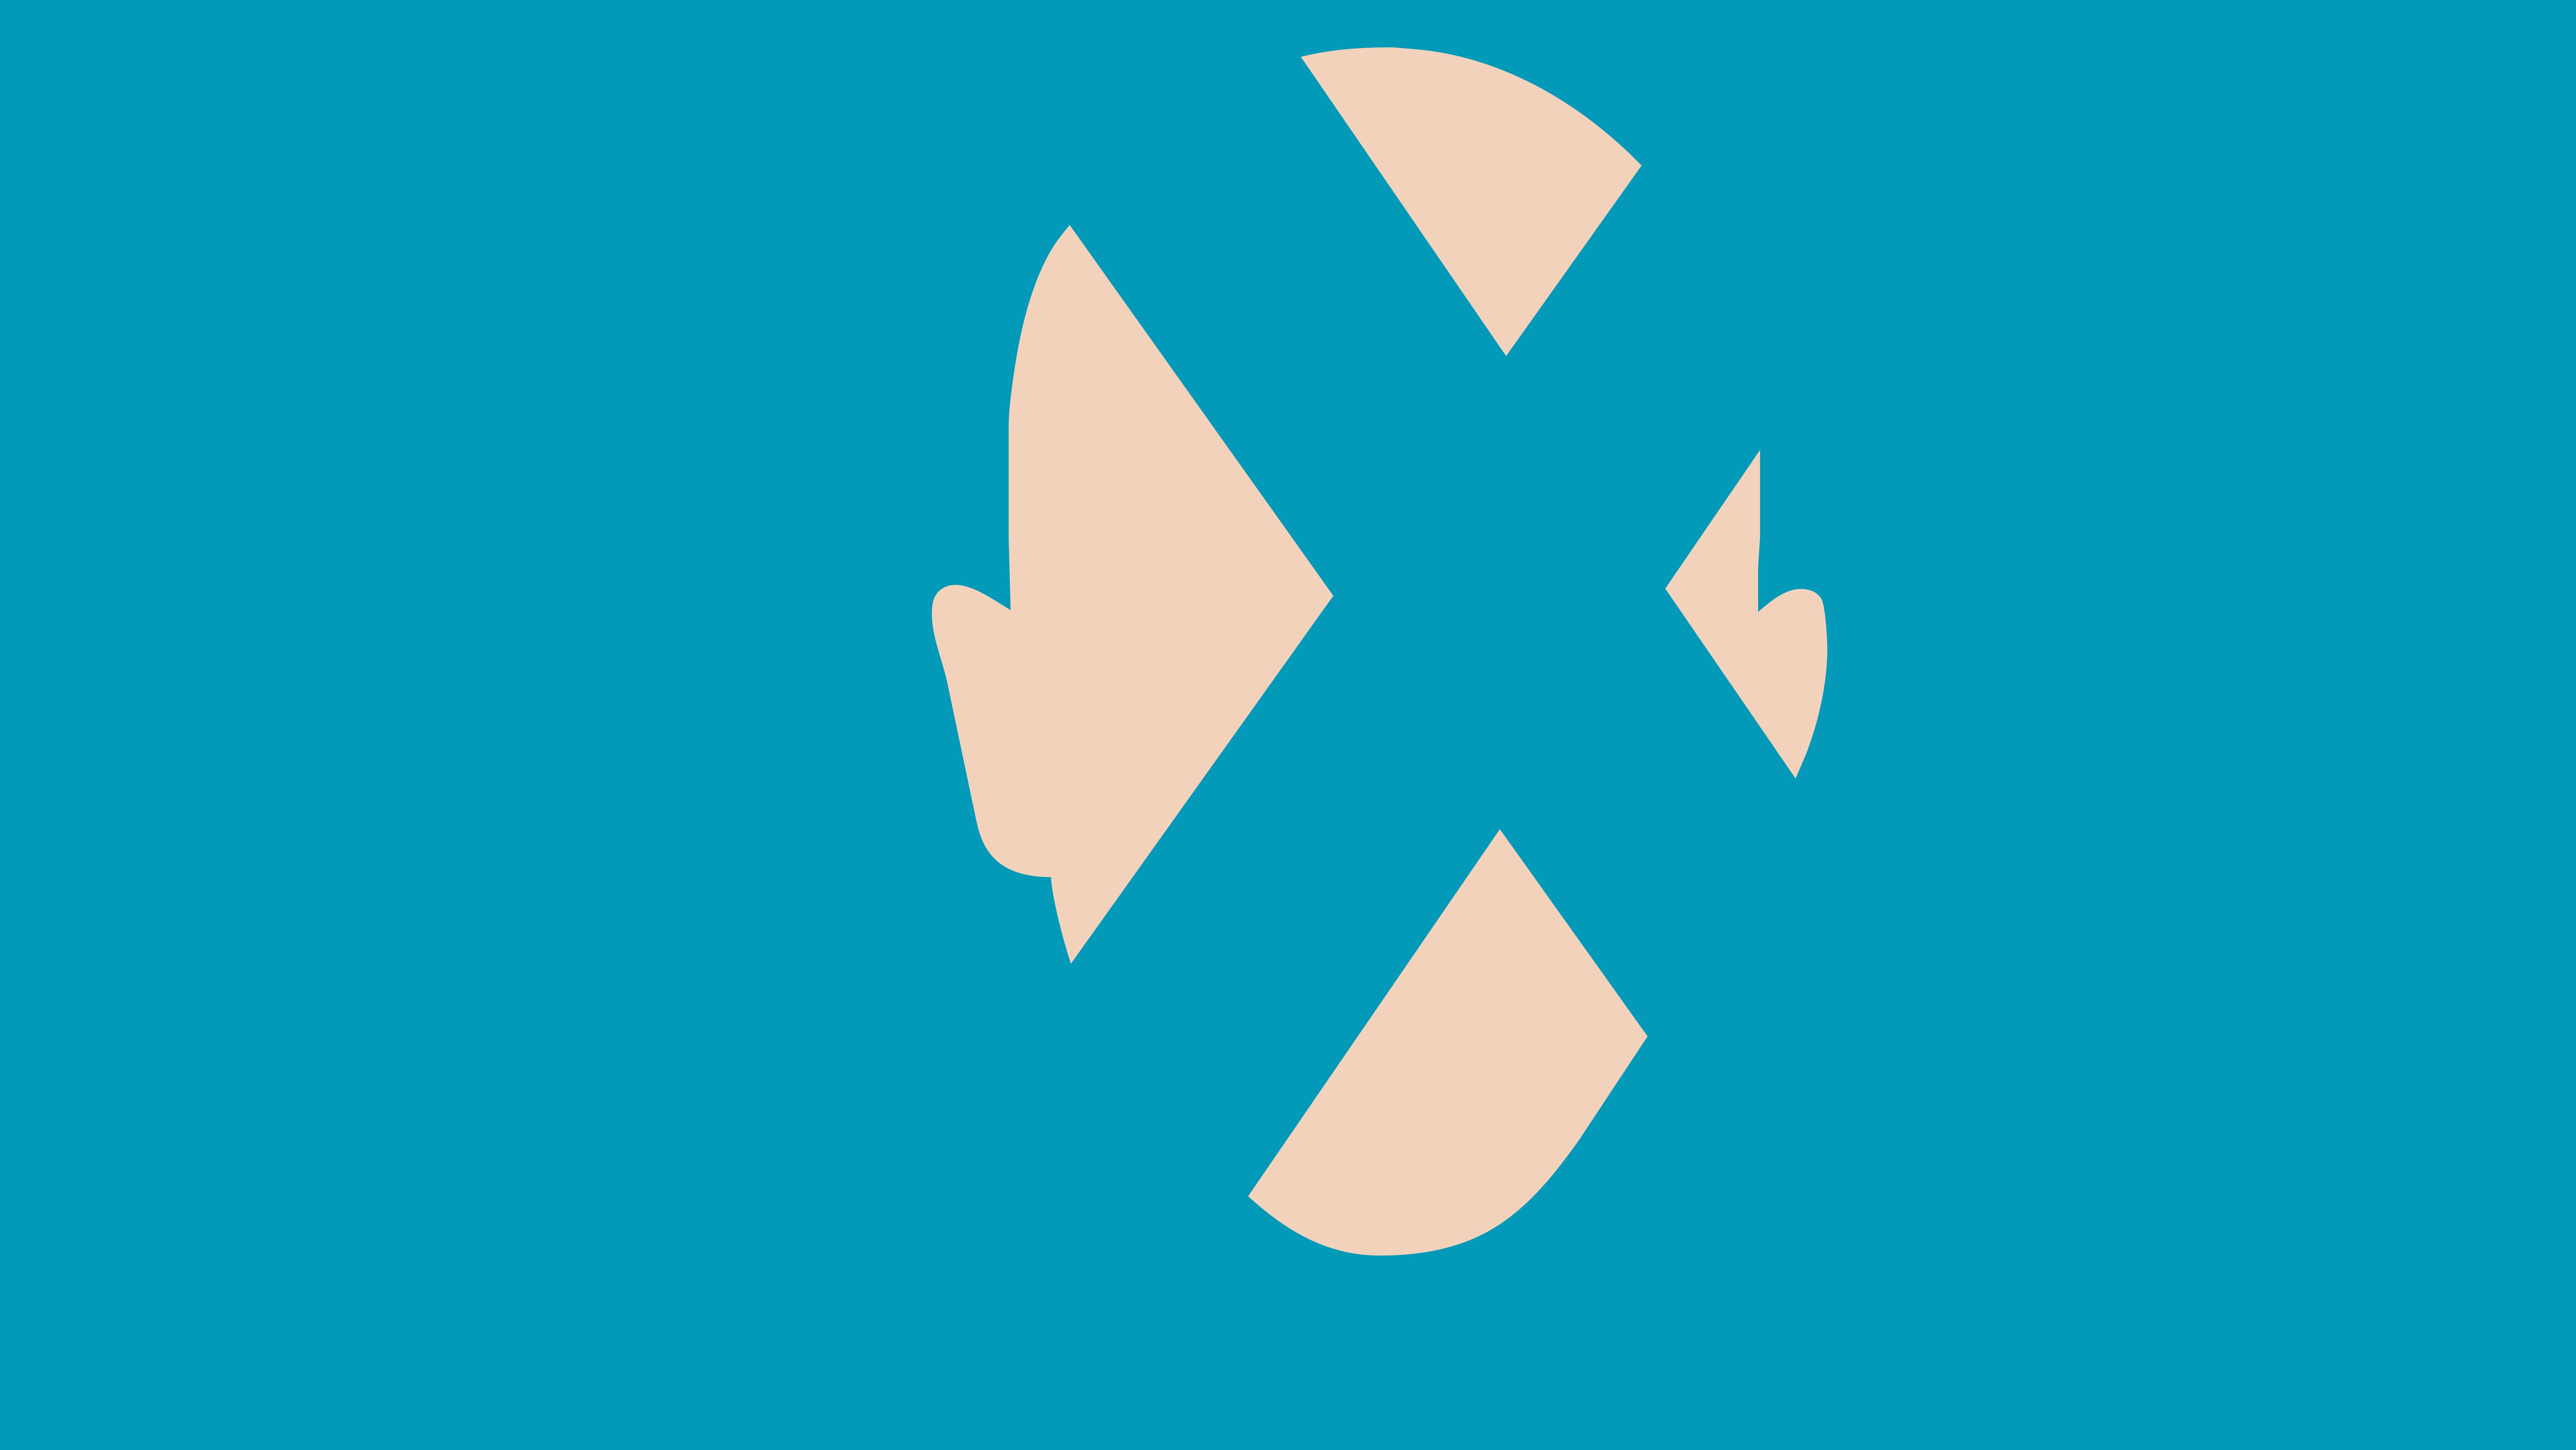 Prof x minimal color by cheetashock on deviantart for Art minimal color